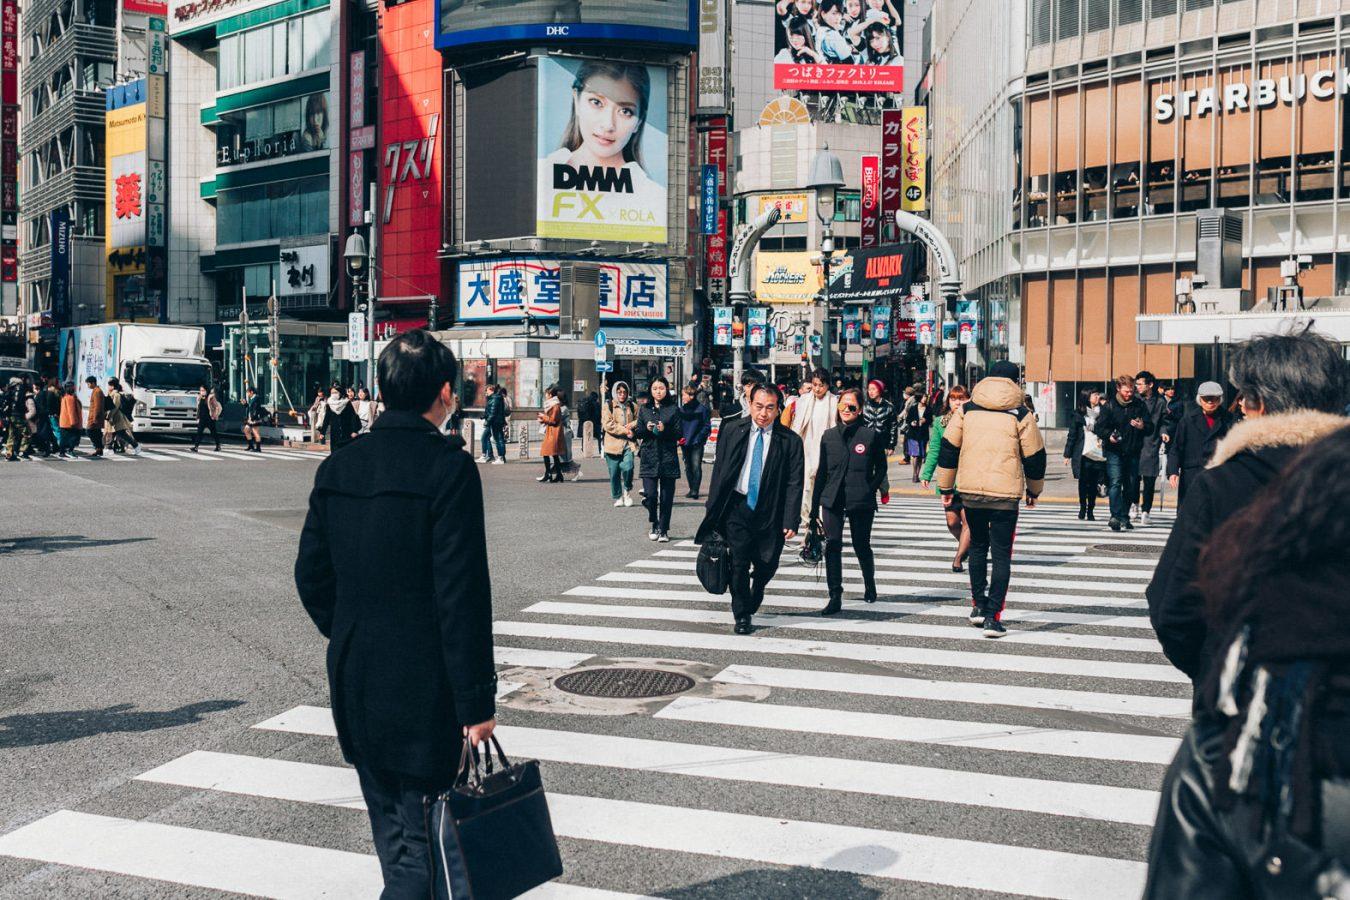 Zebrastreifen in Tokio